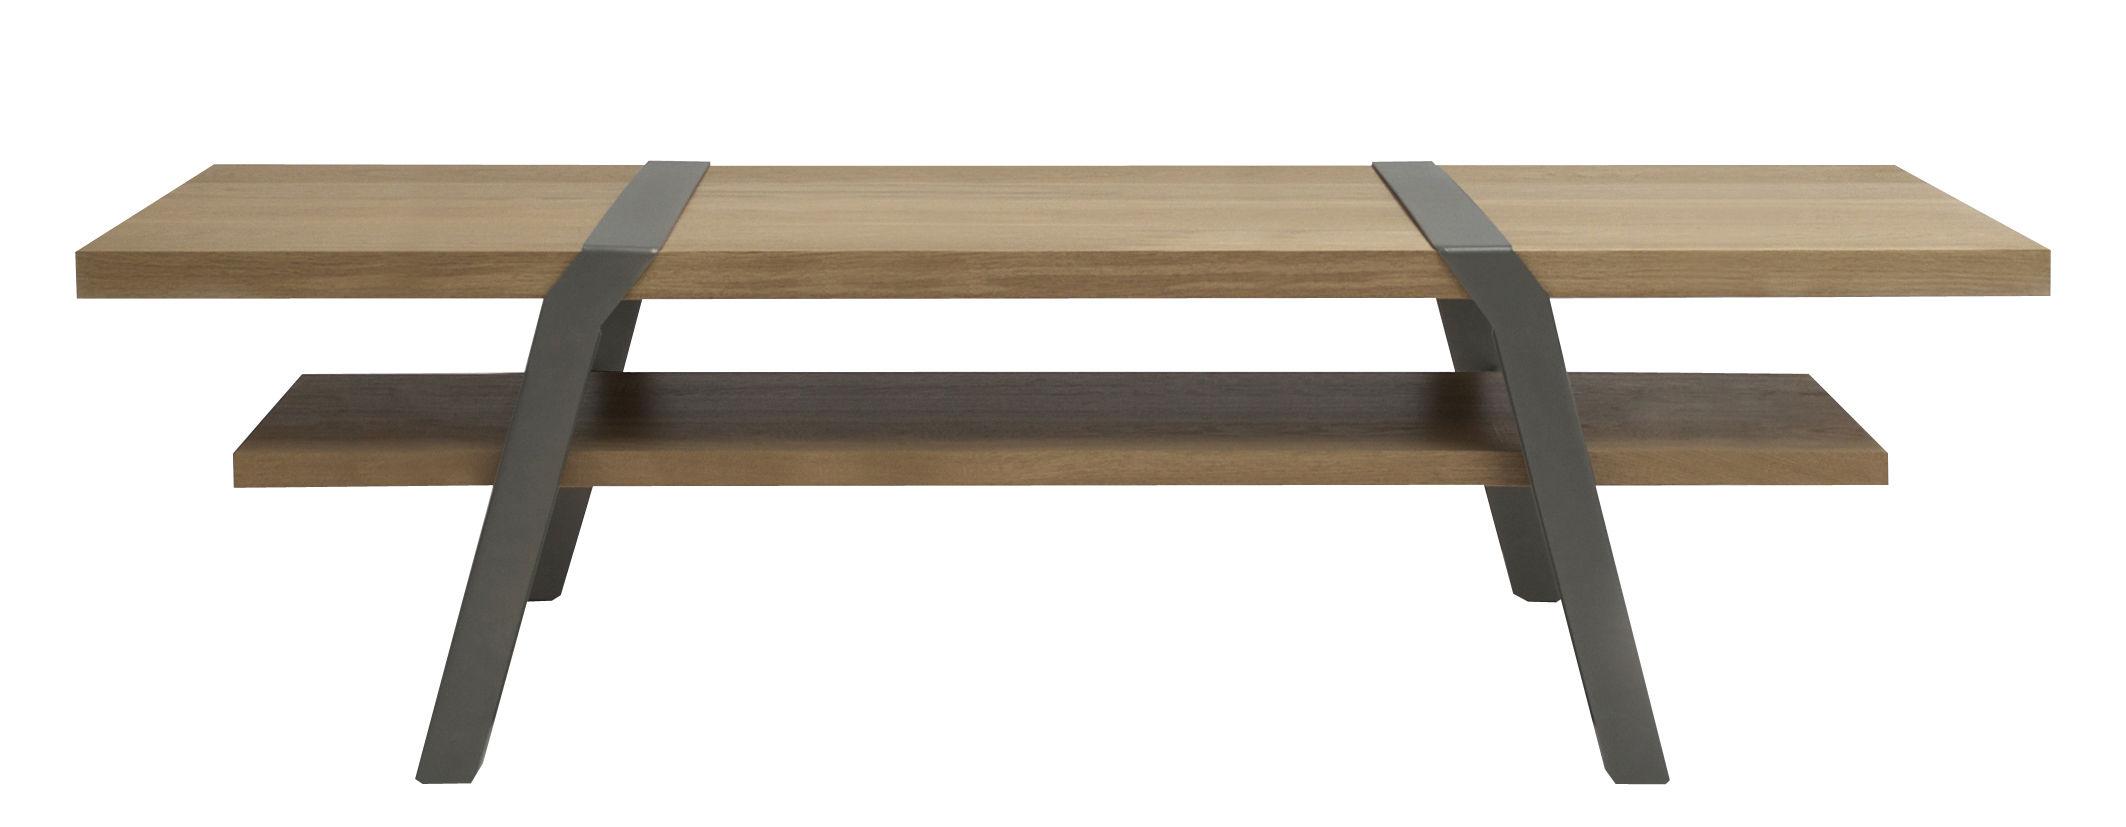 table basse pi 160 x 60 cm gris canon de fusil moaroom. Black Bedroom Furniture Sets. Home Design Ideas